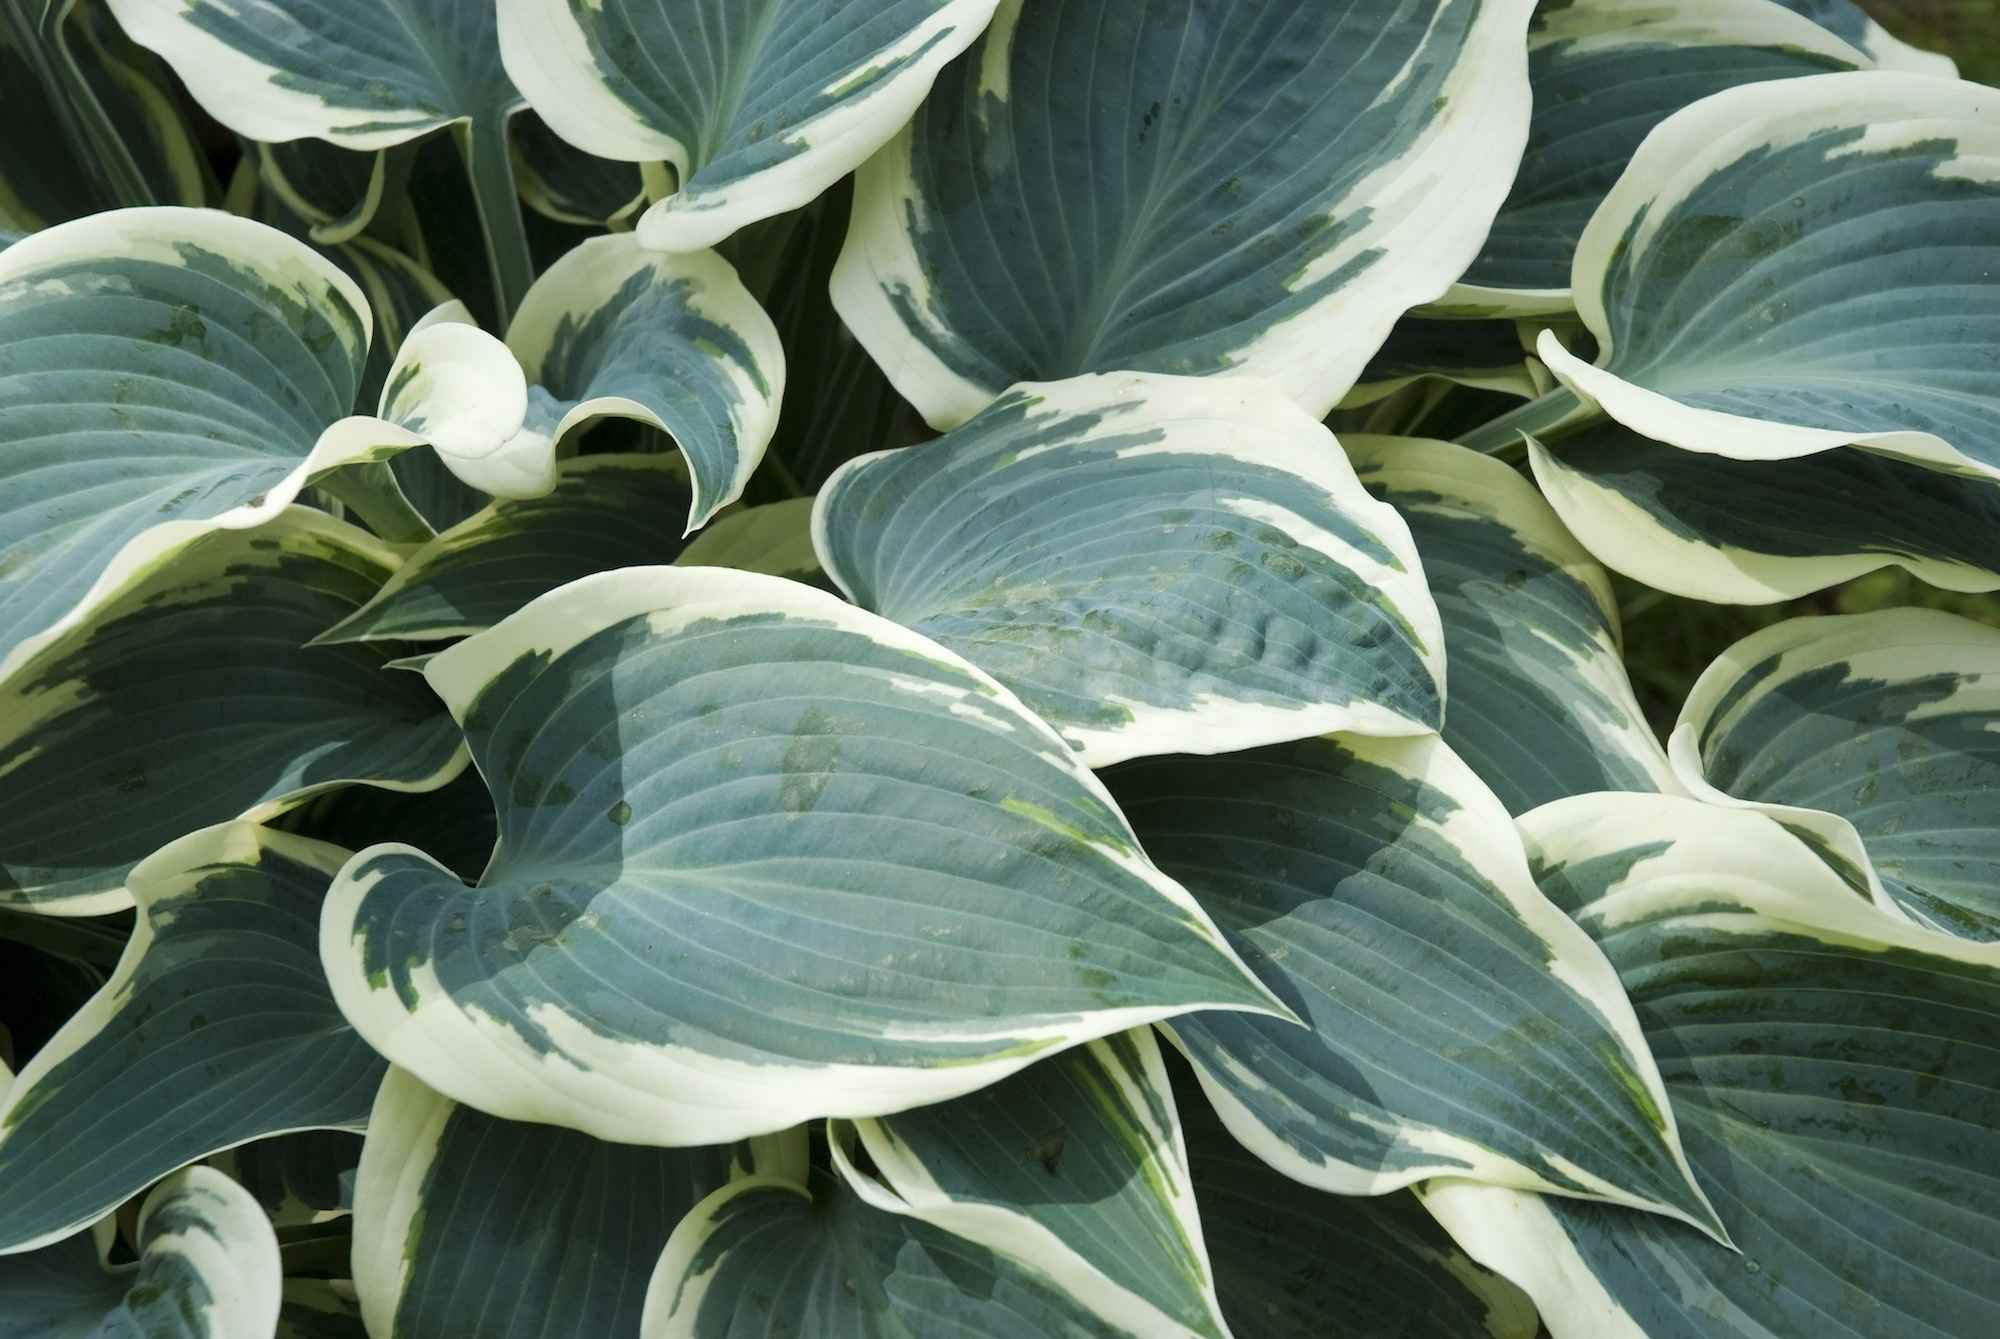 Plantain lily (Hosta) El Nino